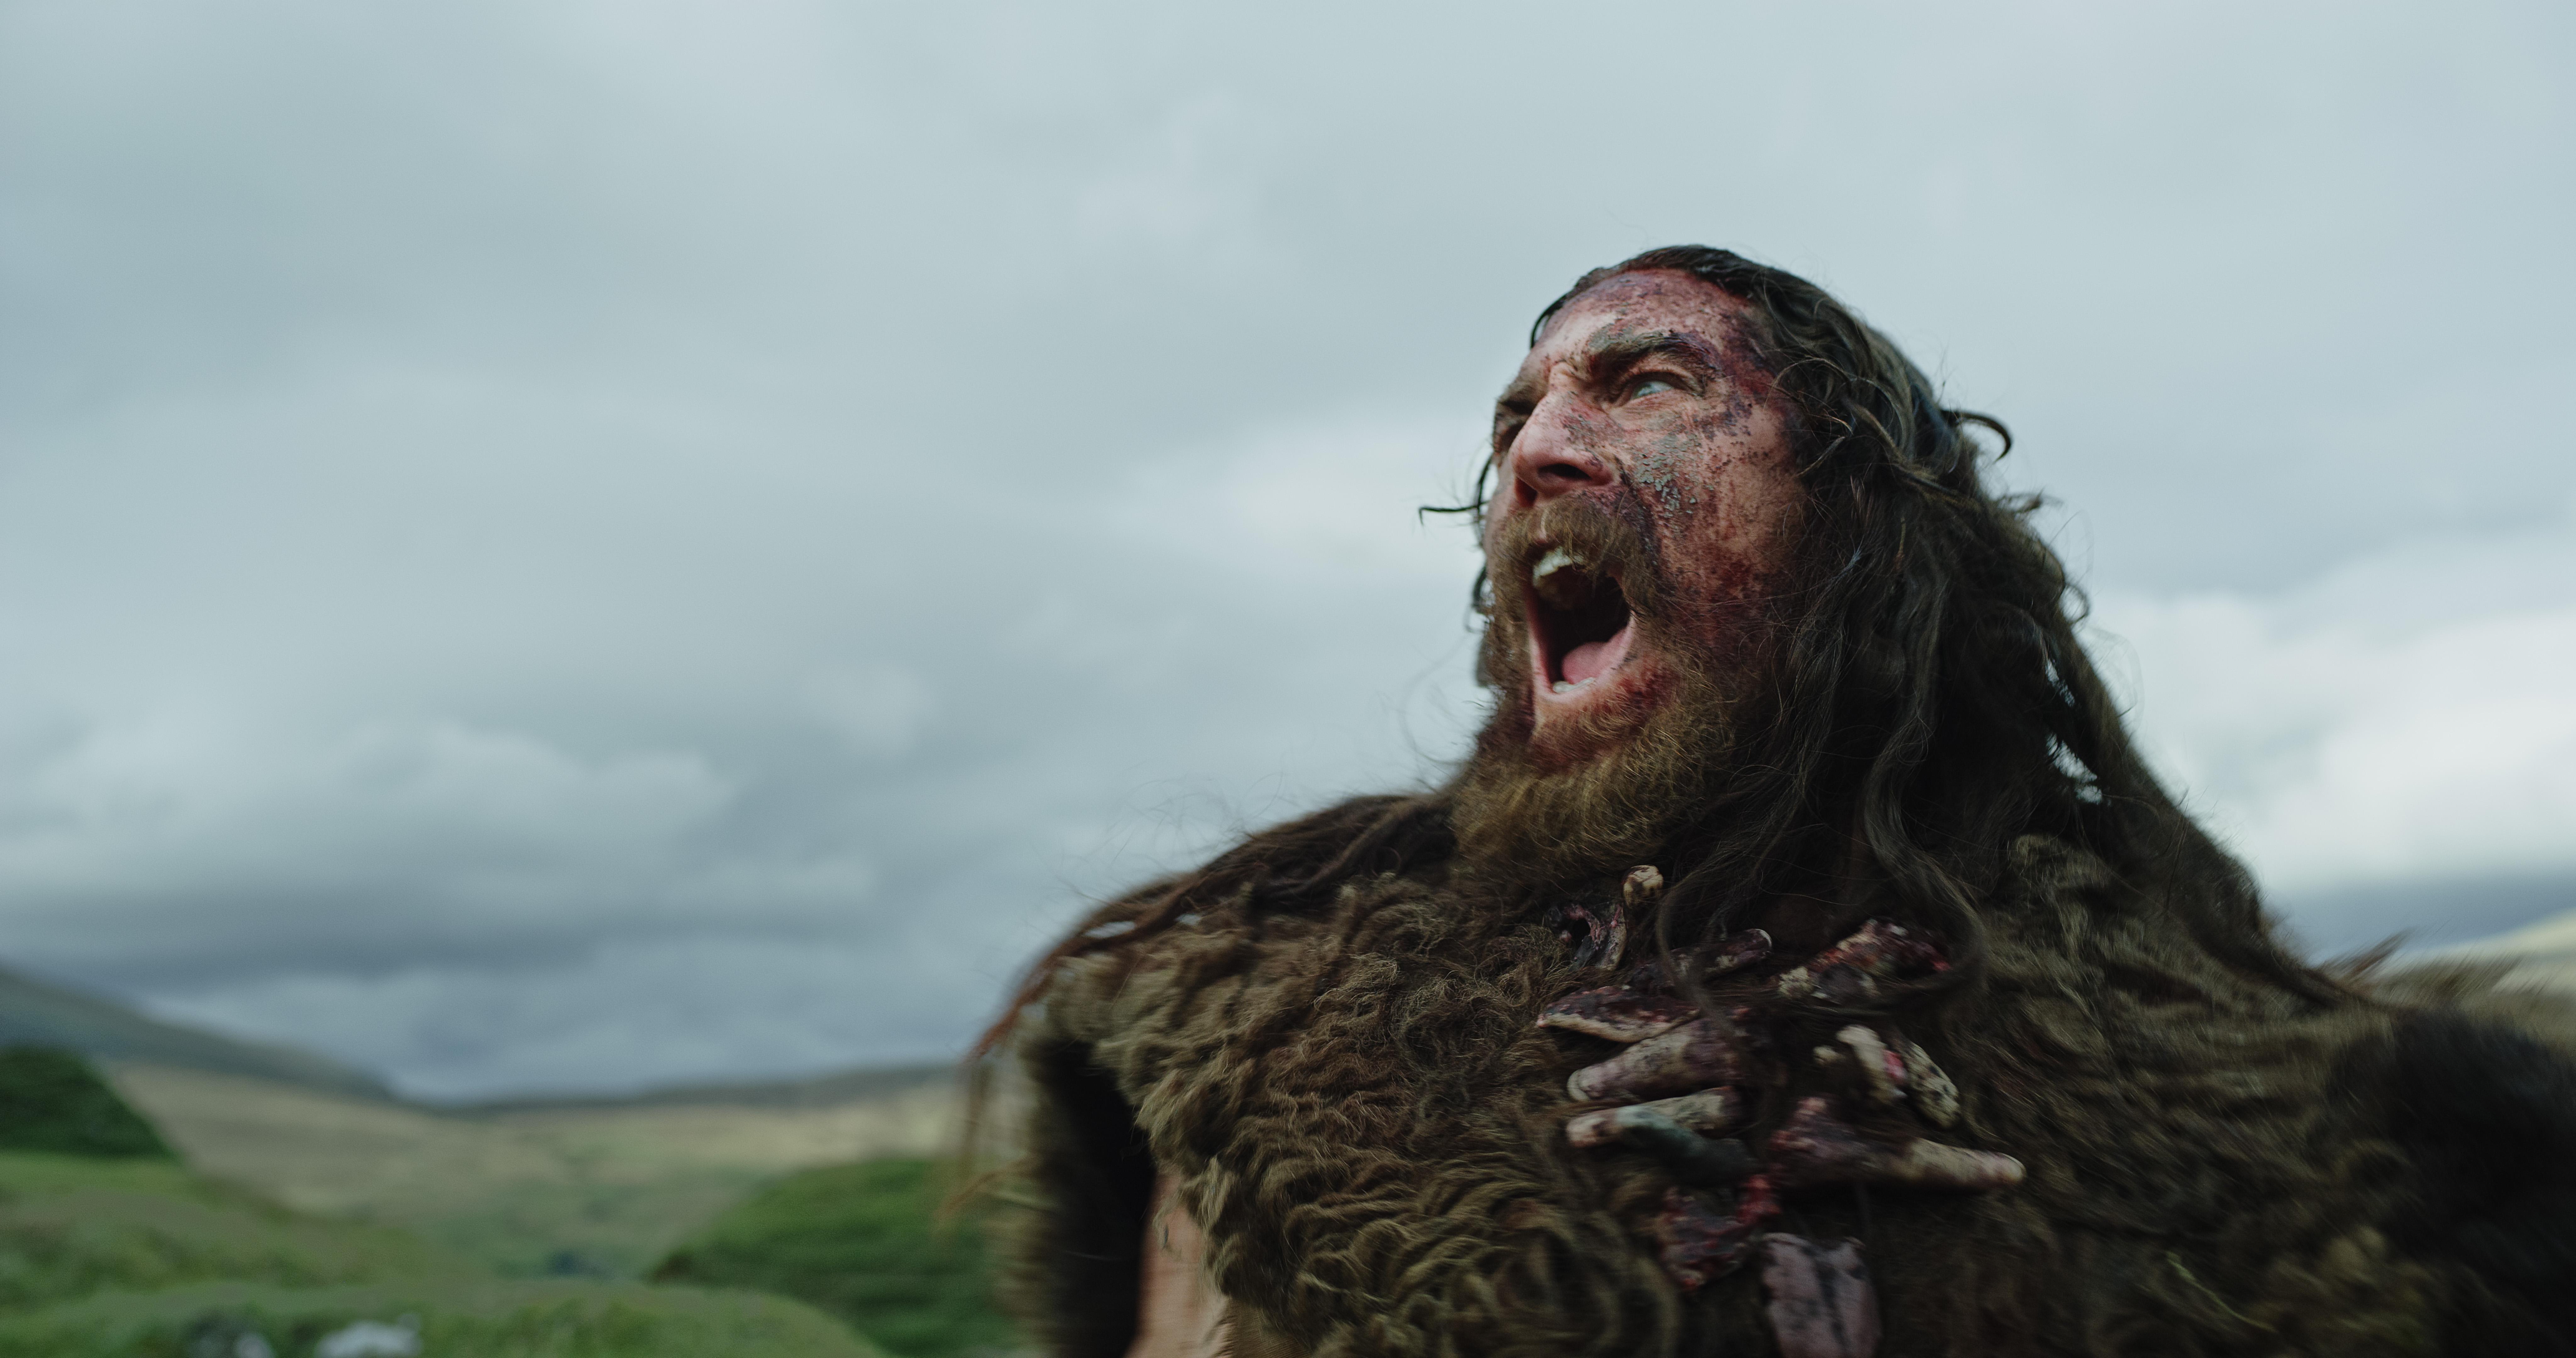 Dan Boie in The Neolith (2020)